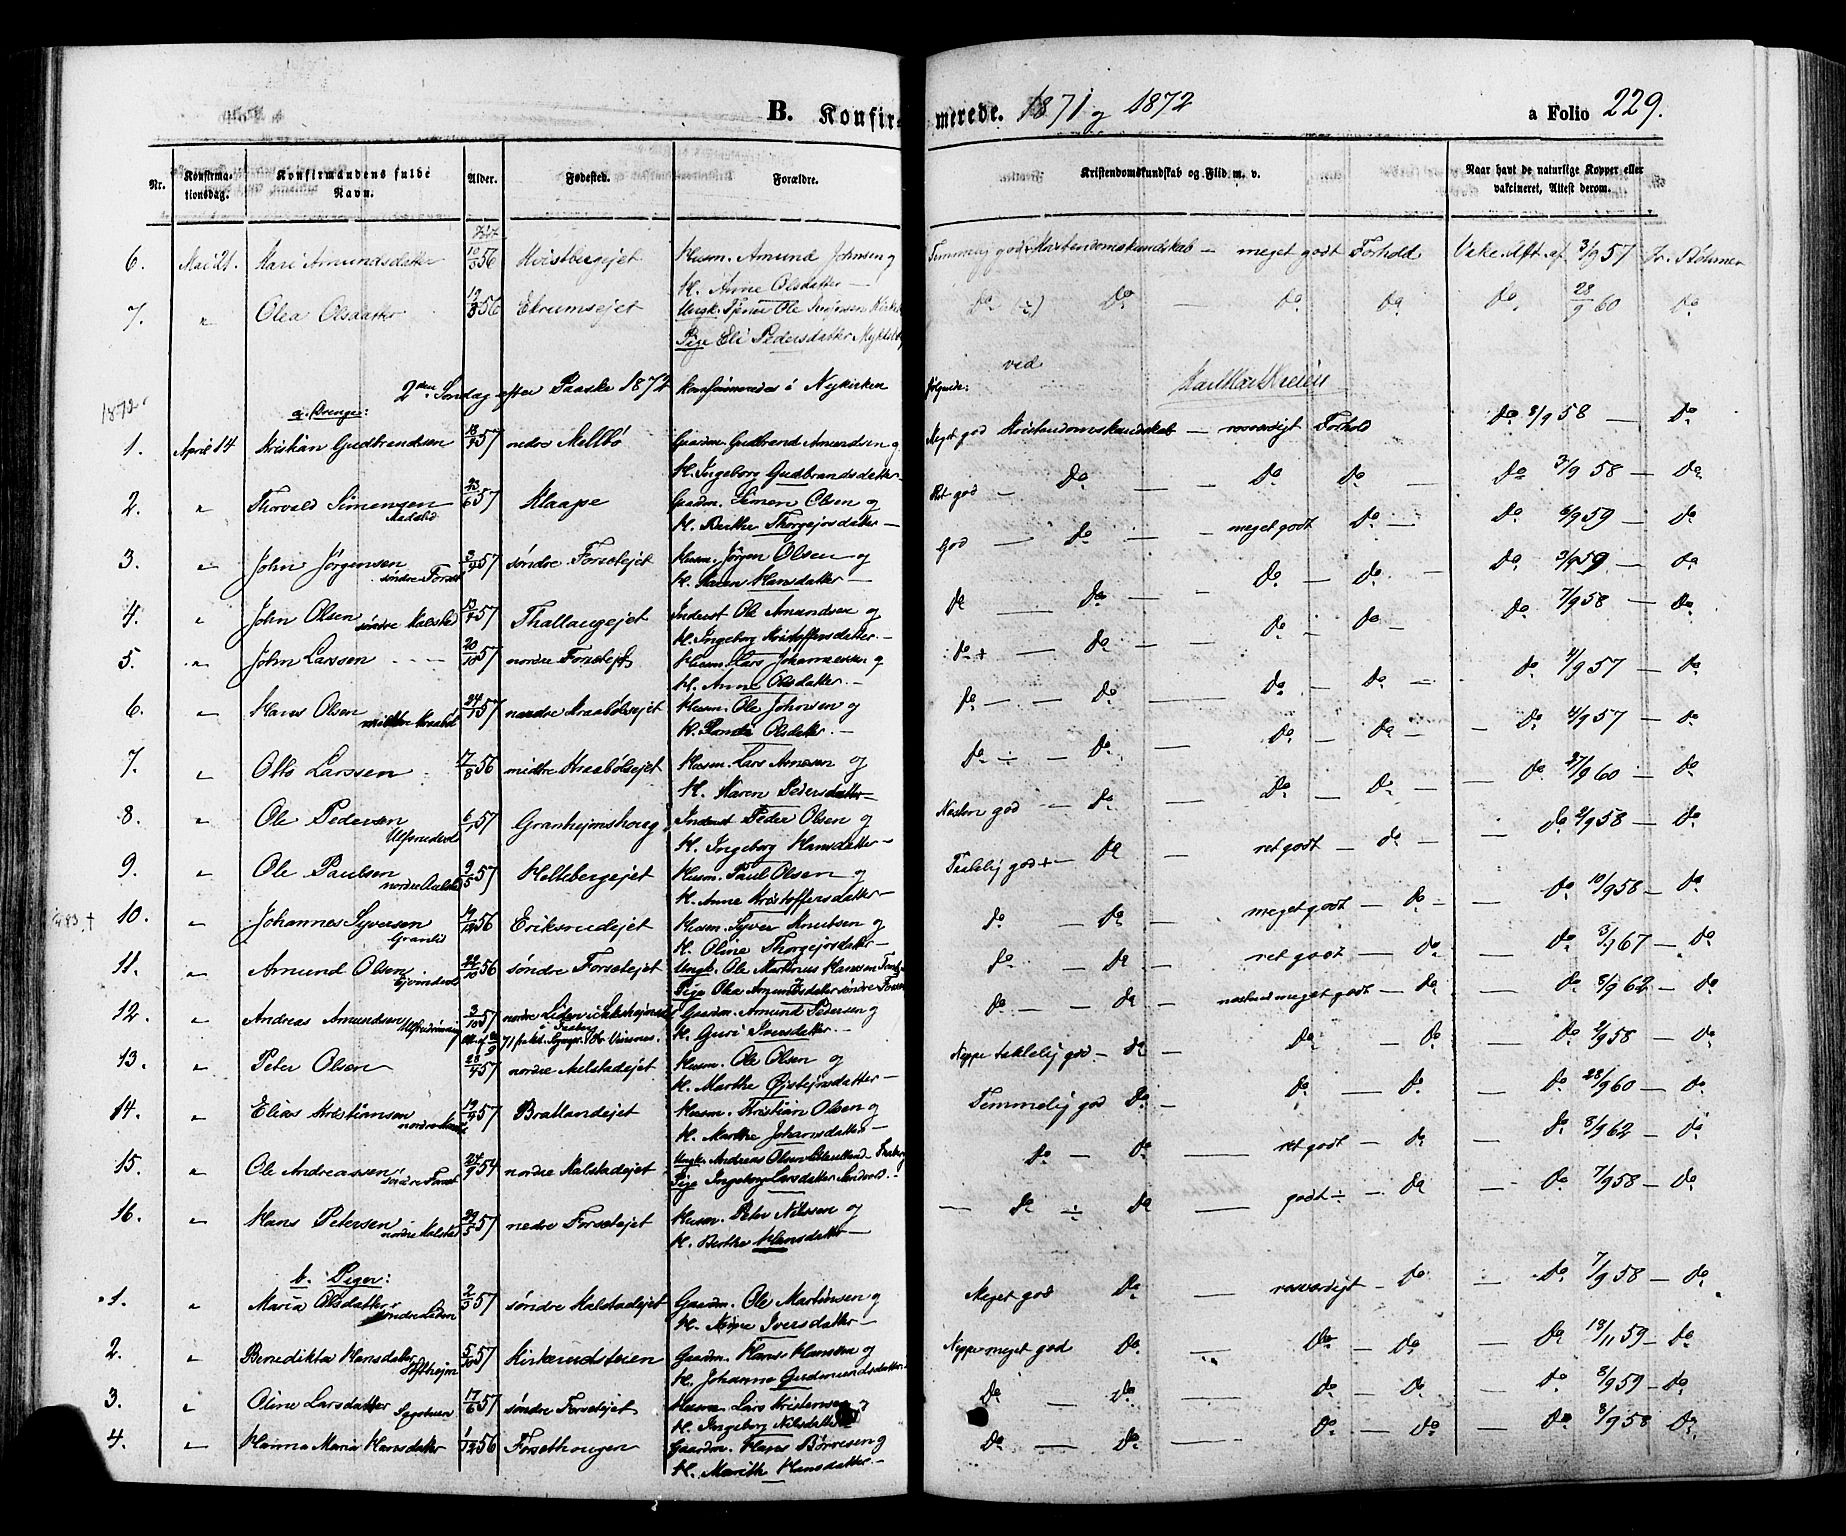 SAH, Gausdal prestekontor, Ministerialbok nr. 10, 1867-1886, s. 229